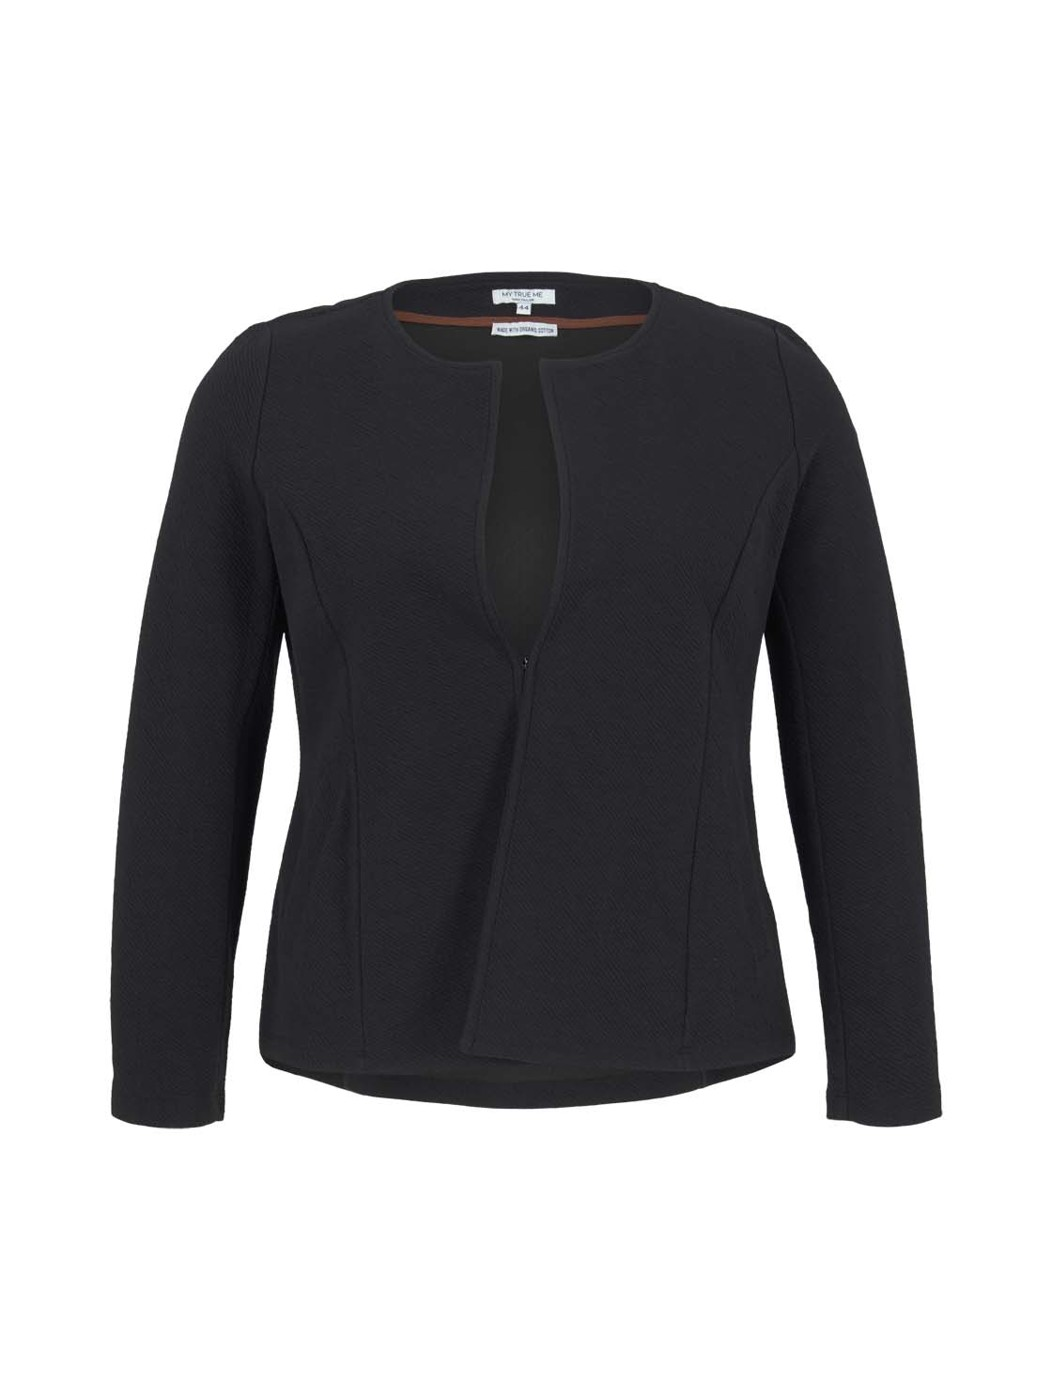 TOM TAILOR  blazer with structure - Damen